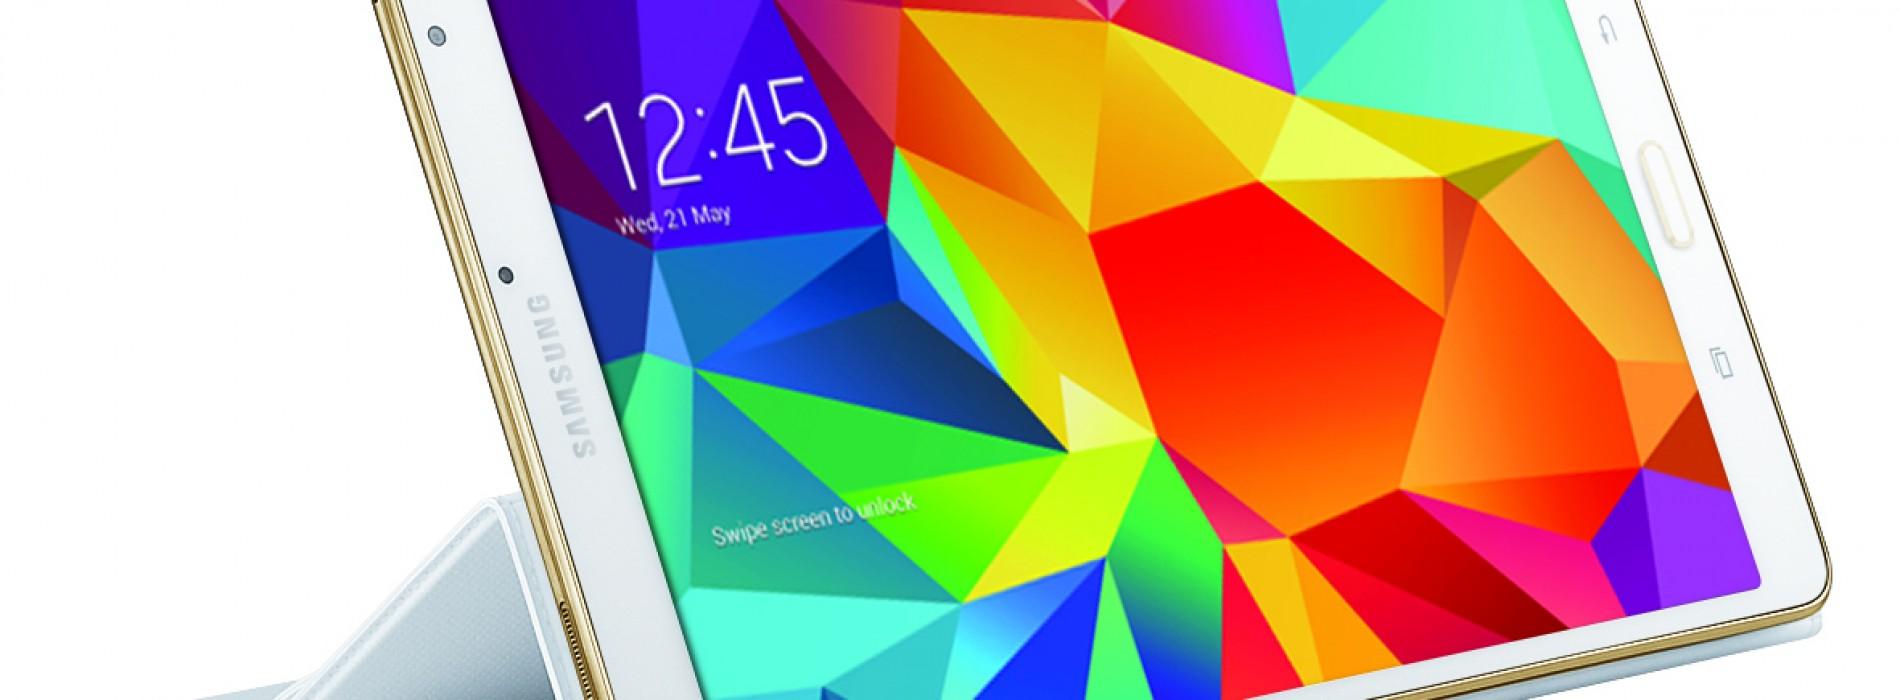 Samsung Galaxy Tab S accessories gallery